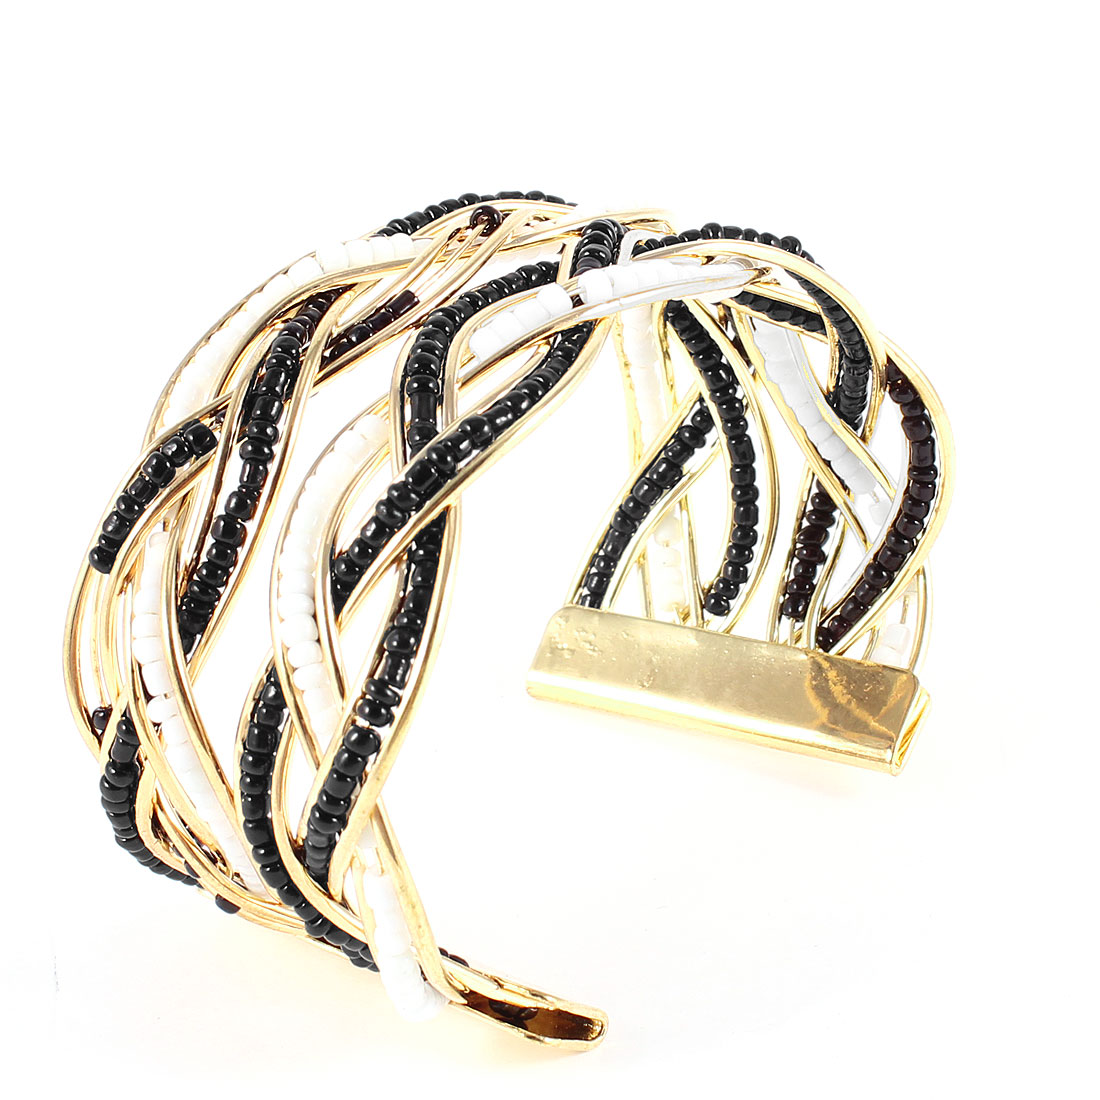 Ladies Black White Plastic Beeds Inlaid Metal Cross Woven Open Cuff Wrist Bangle